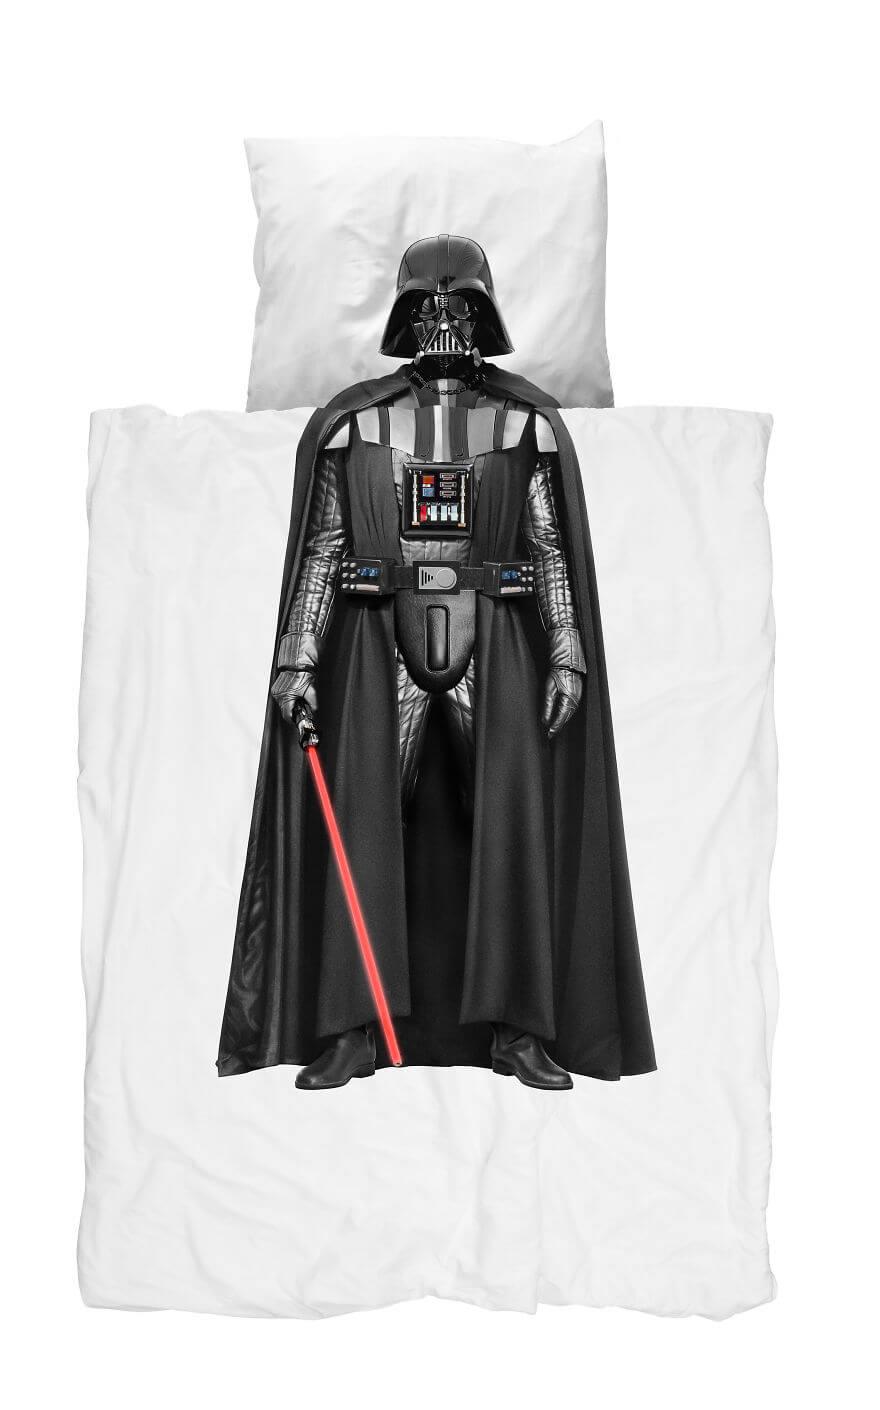 star wars bedding 2 (1)